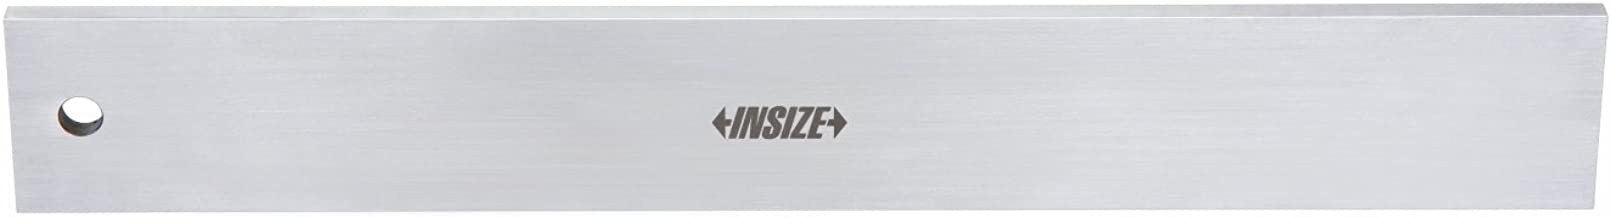 INSIZE 7117-300 精密直边,30.48 厘米